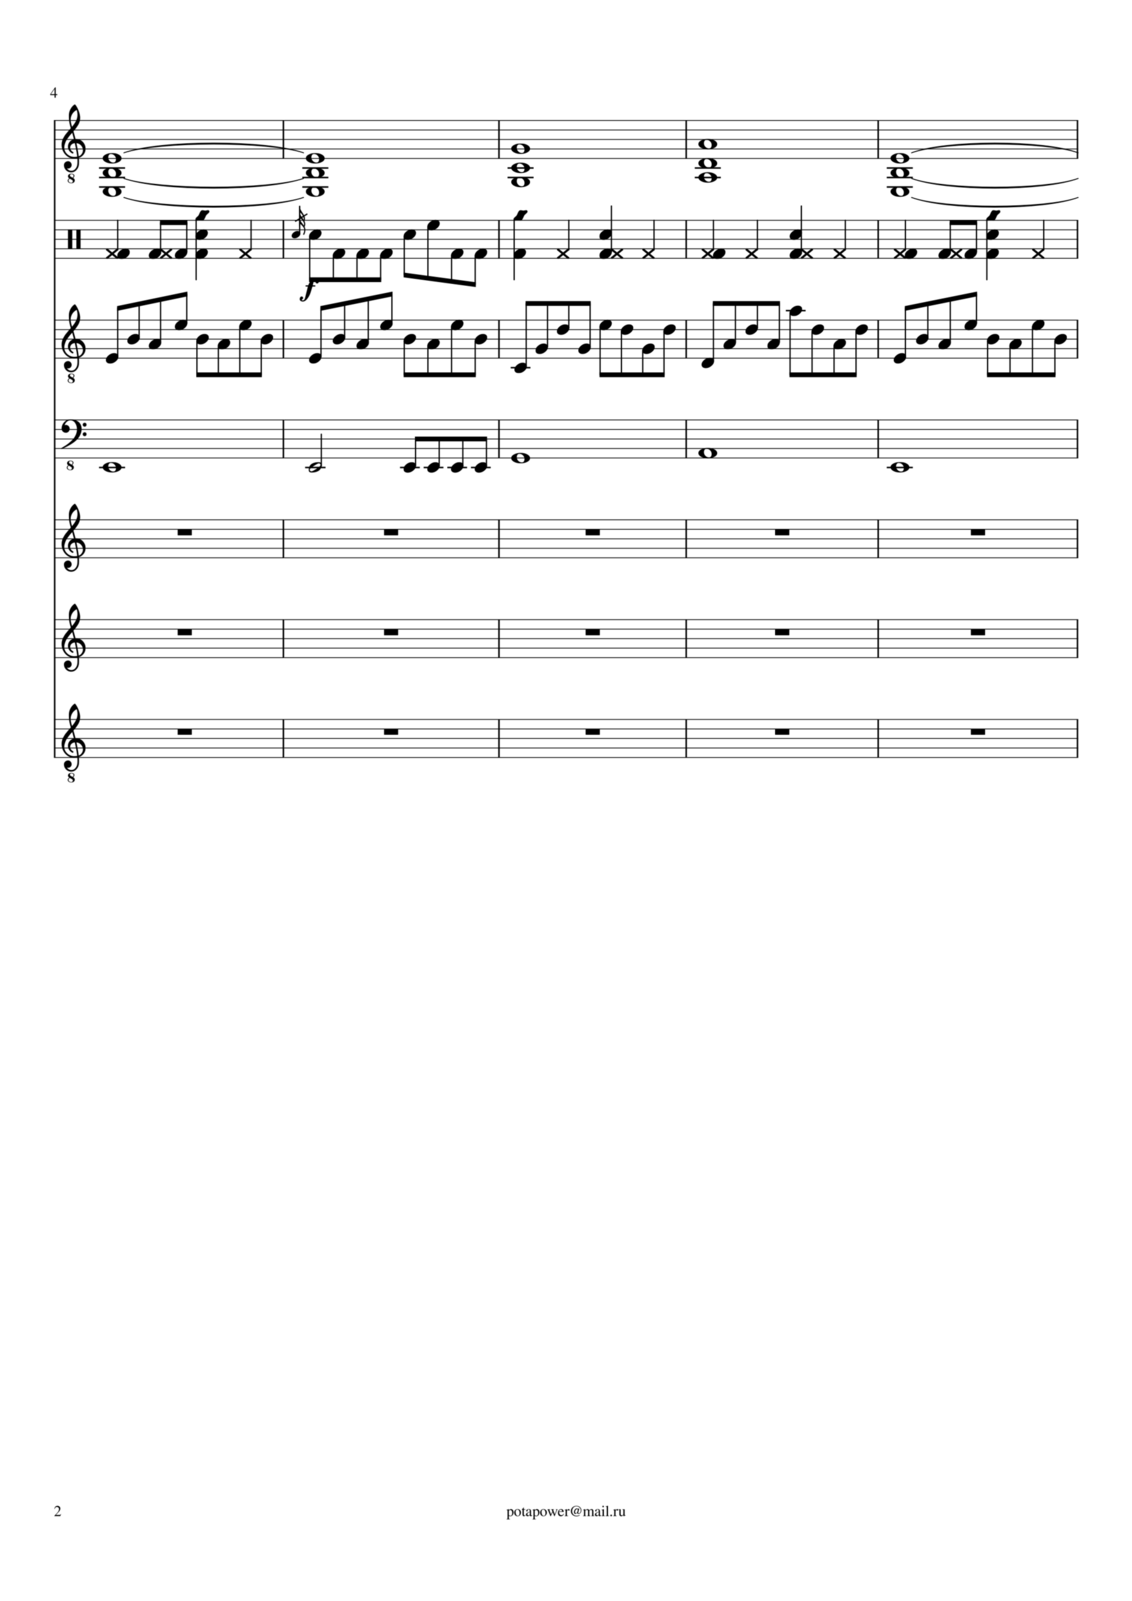 Ten lyubvi slide, Image 2